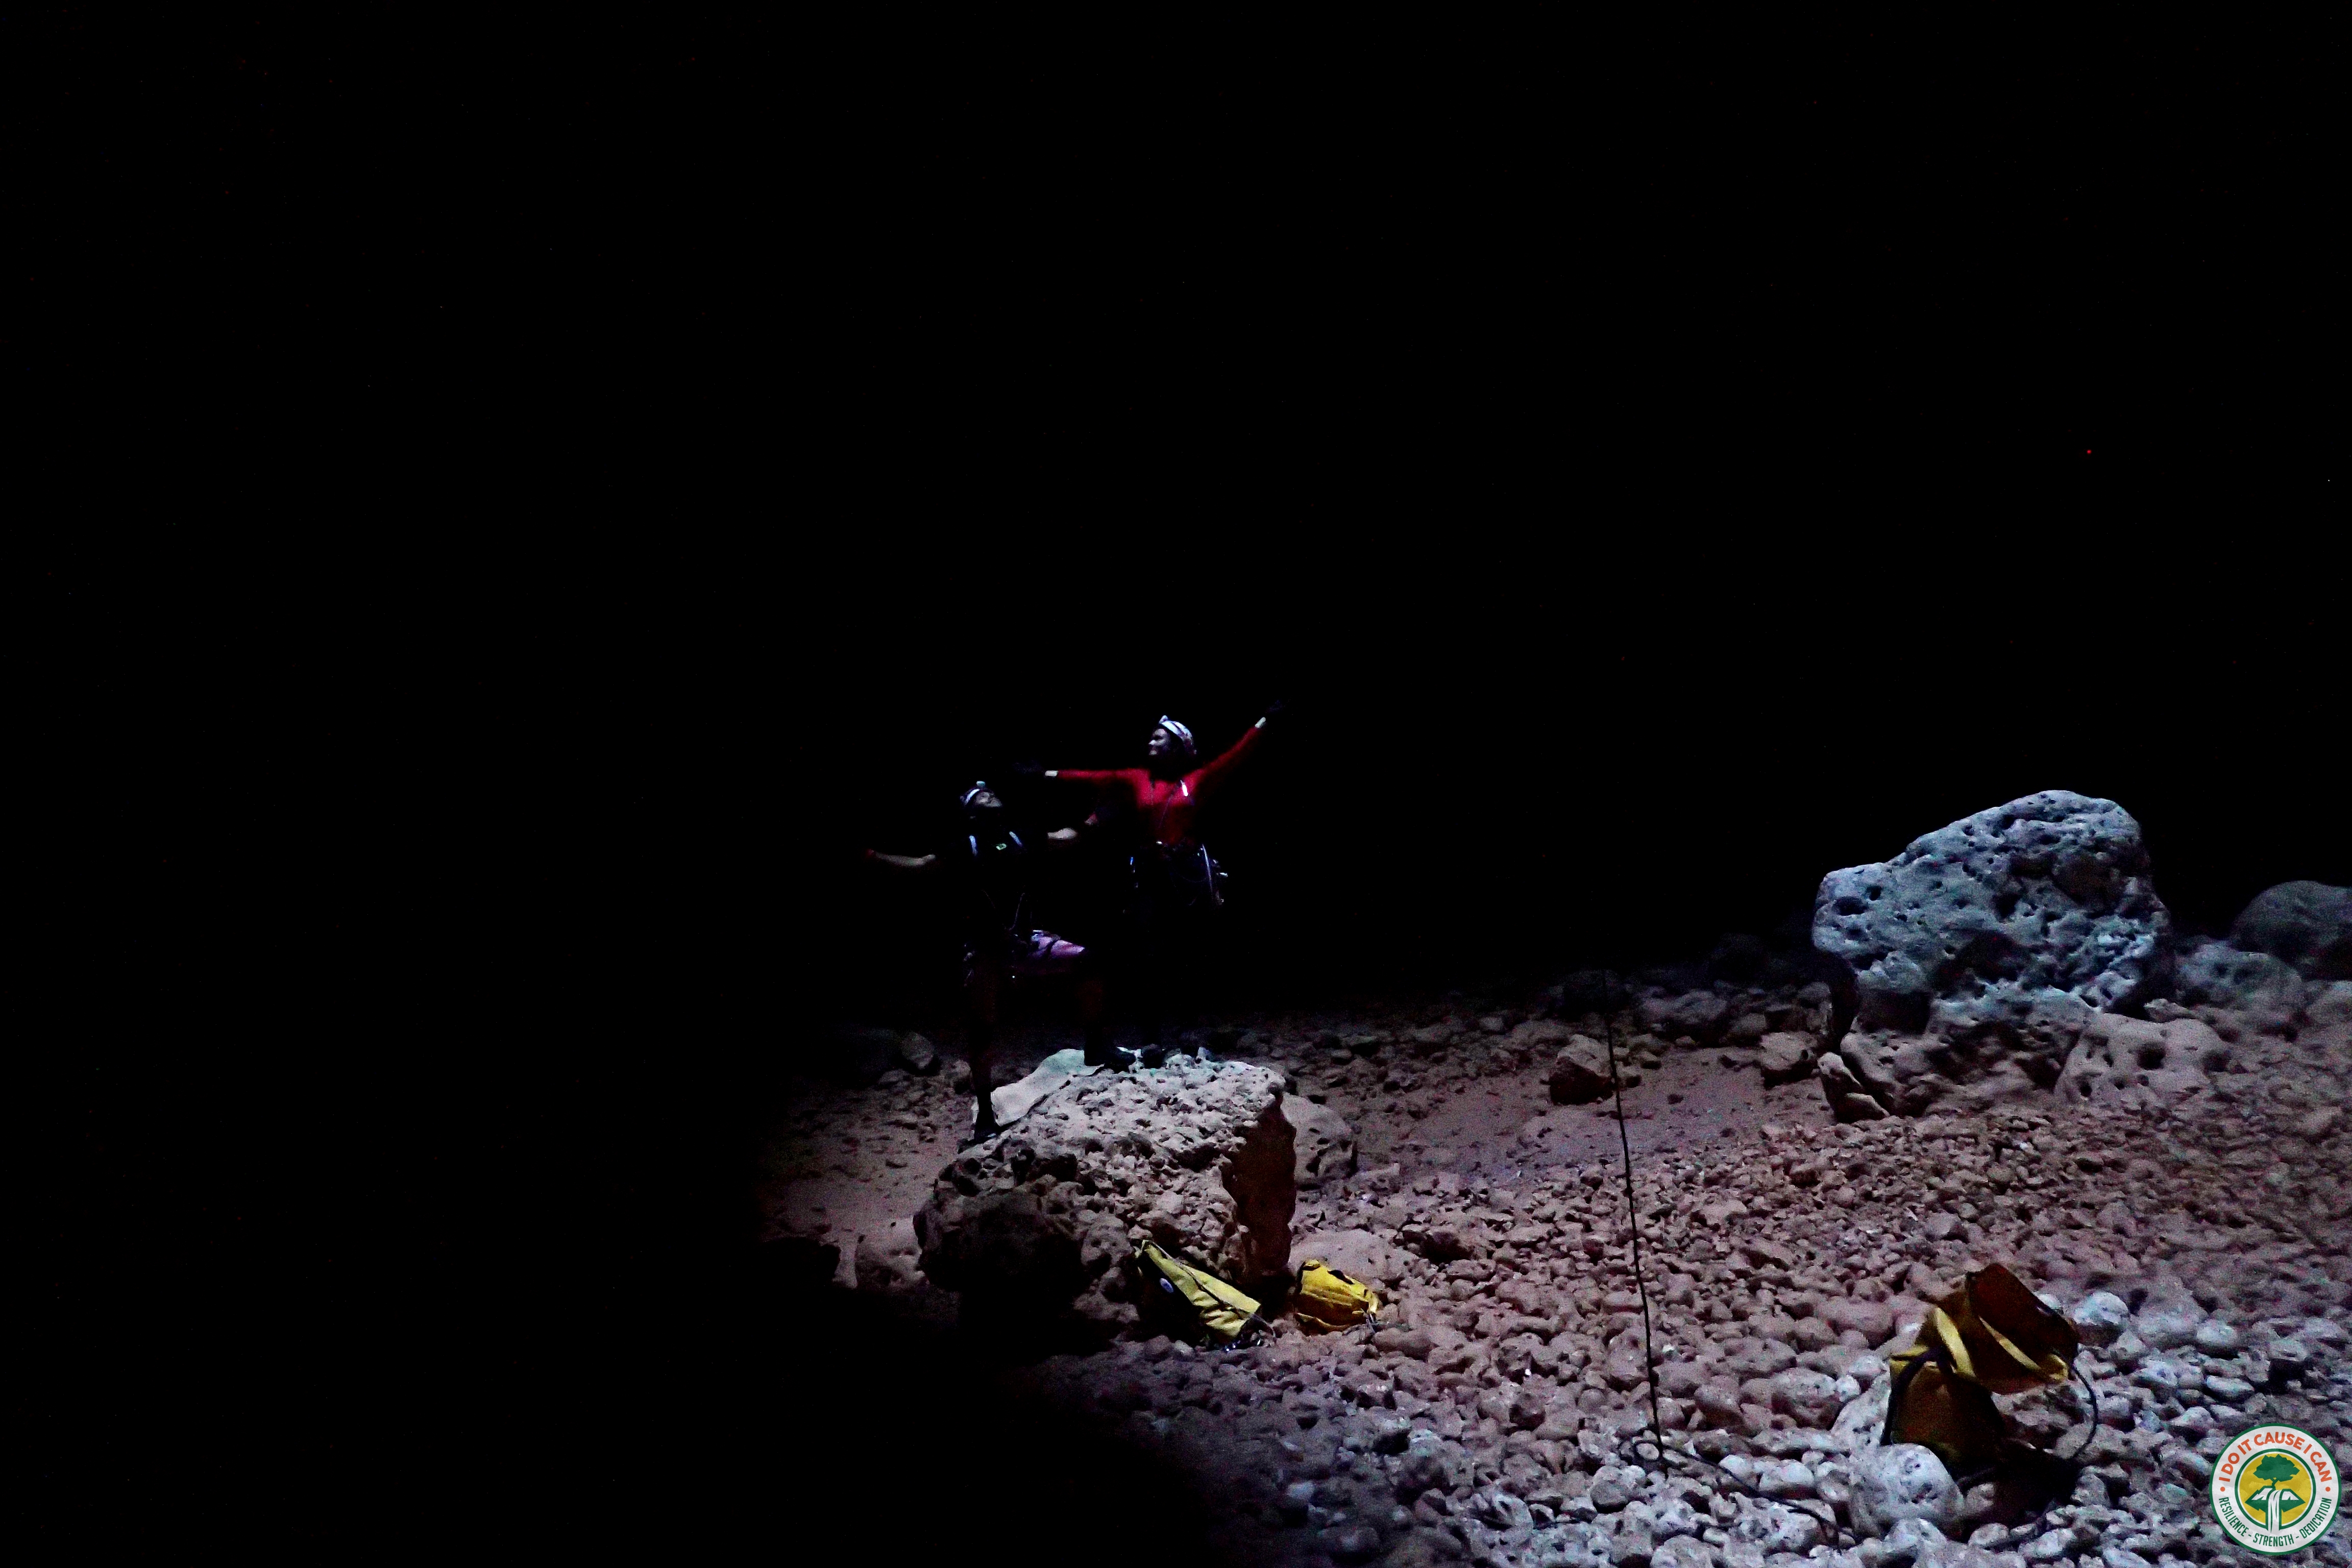 Joanna Slomiak & Toufic Abou Nader Arch cave oman